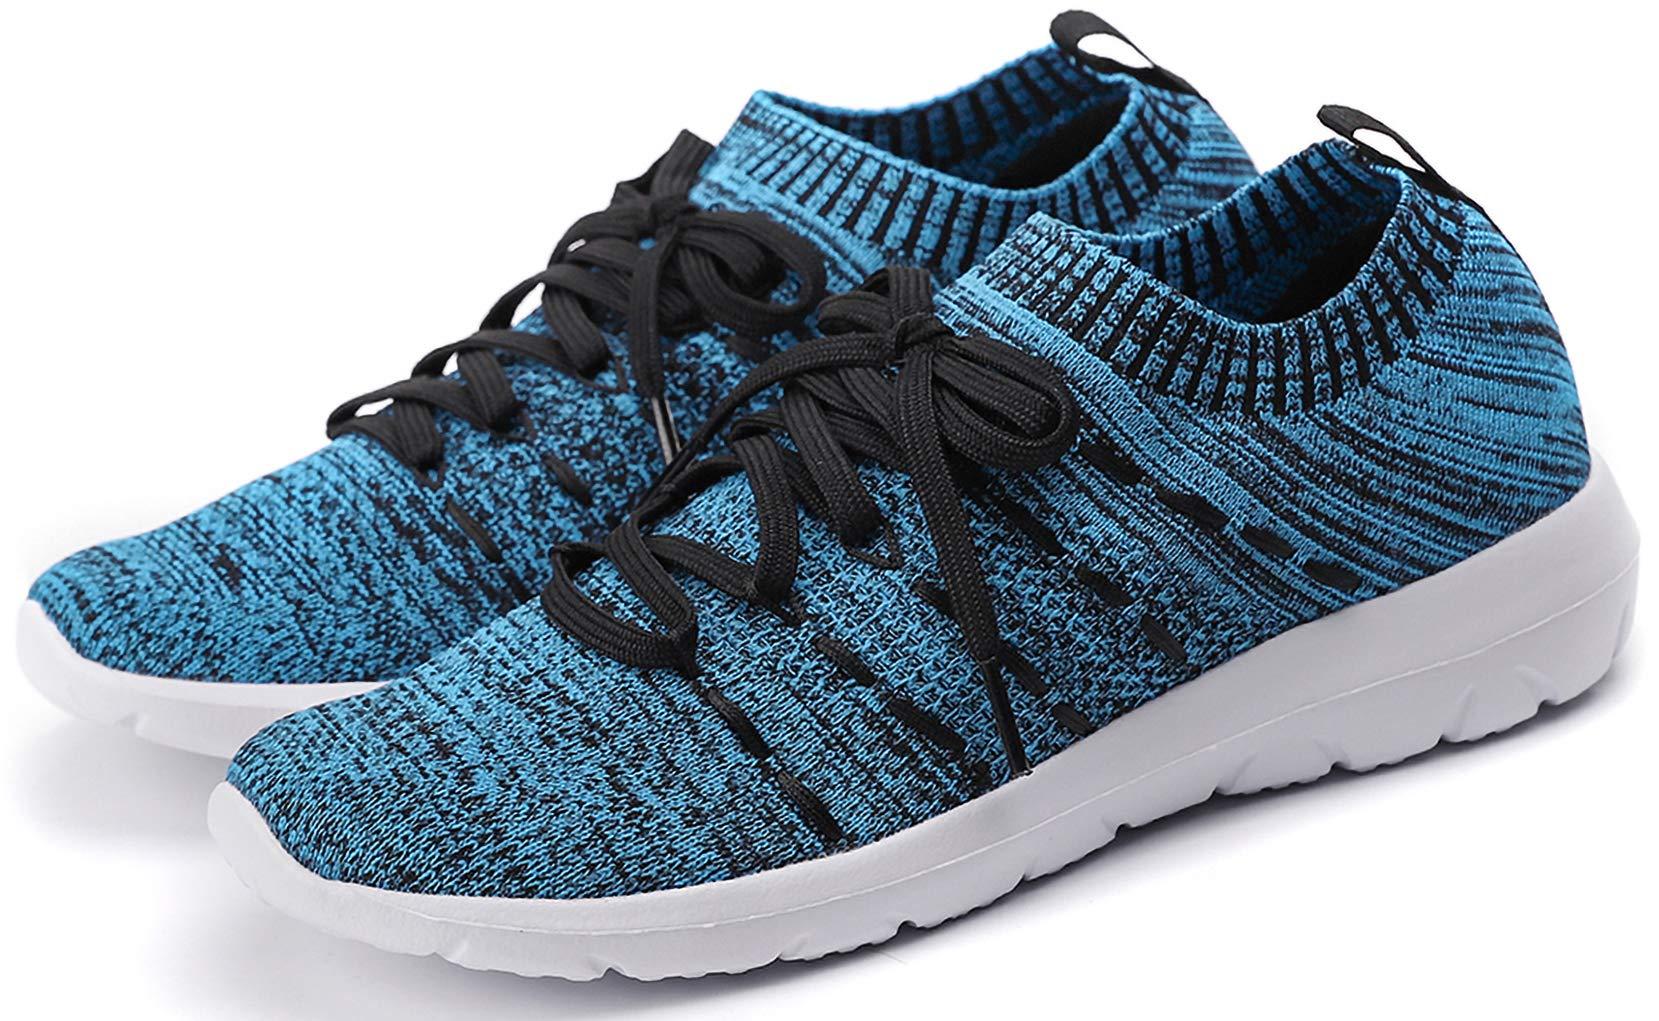 PromArder Women's Walking Shoes Slip On Athletic Running Sneakers Knit Mesh Comfortable Work Shoe